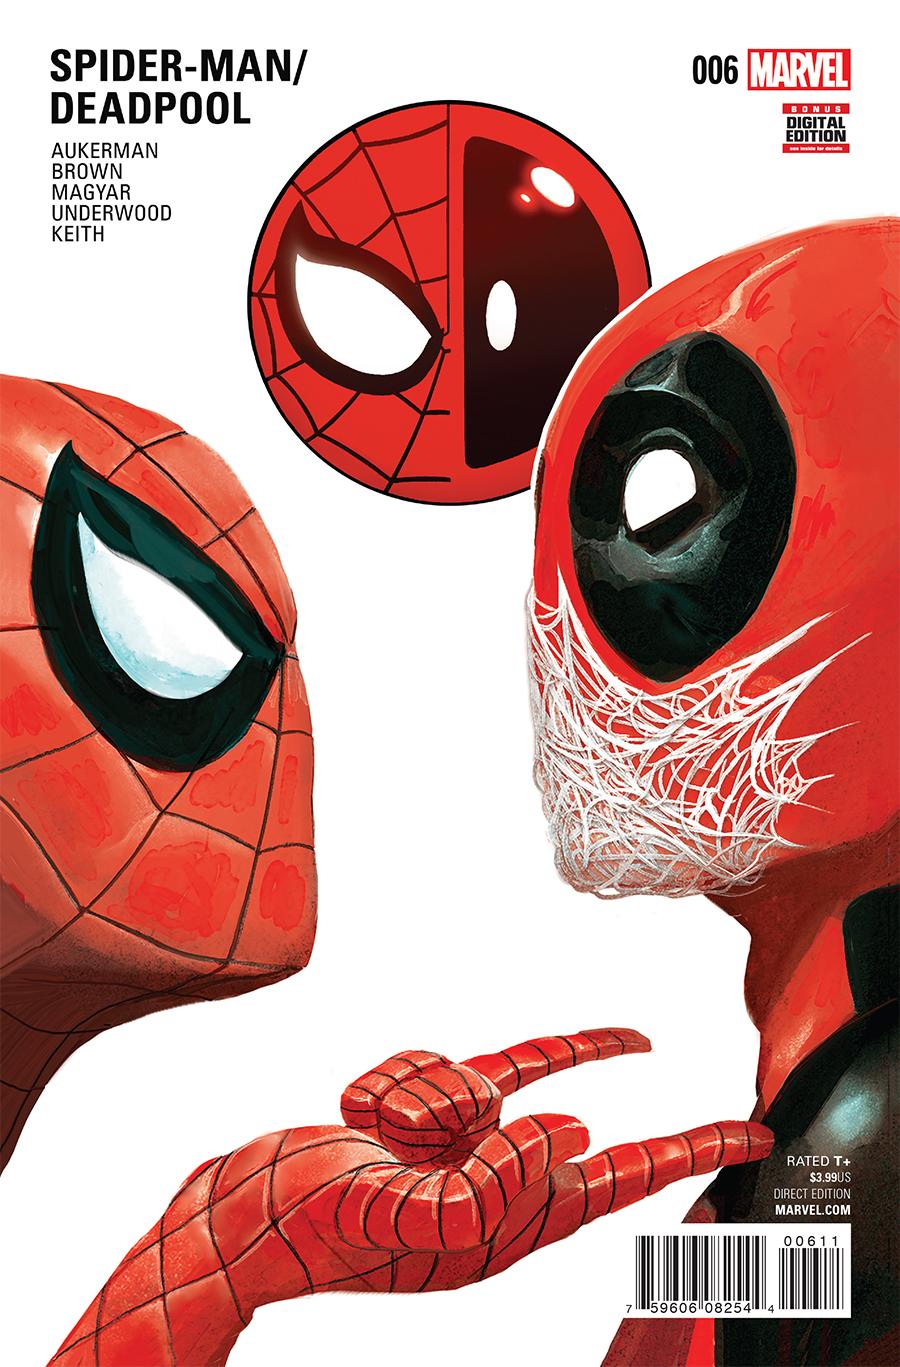 Spider-Man / Deadpool #6